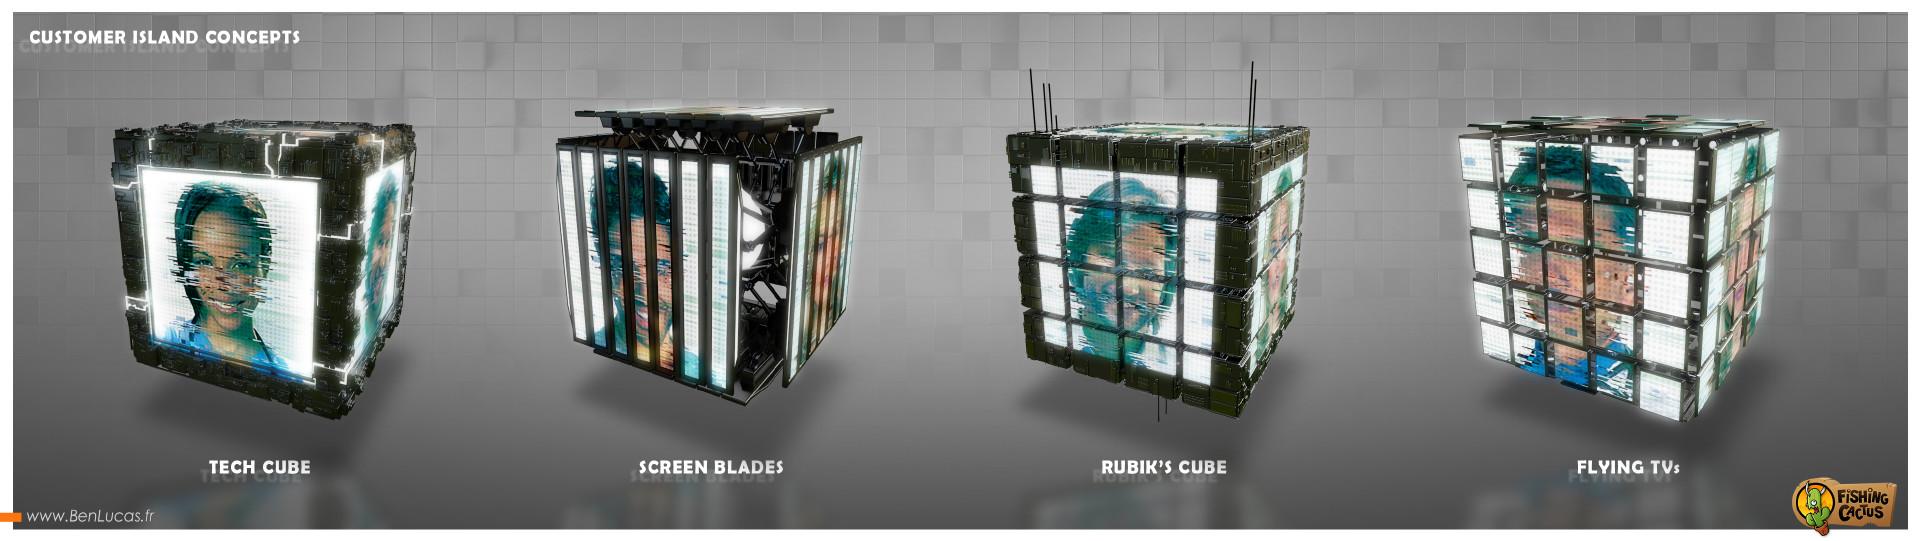 Benjamin lucas fc customer island cubes